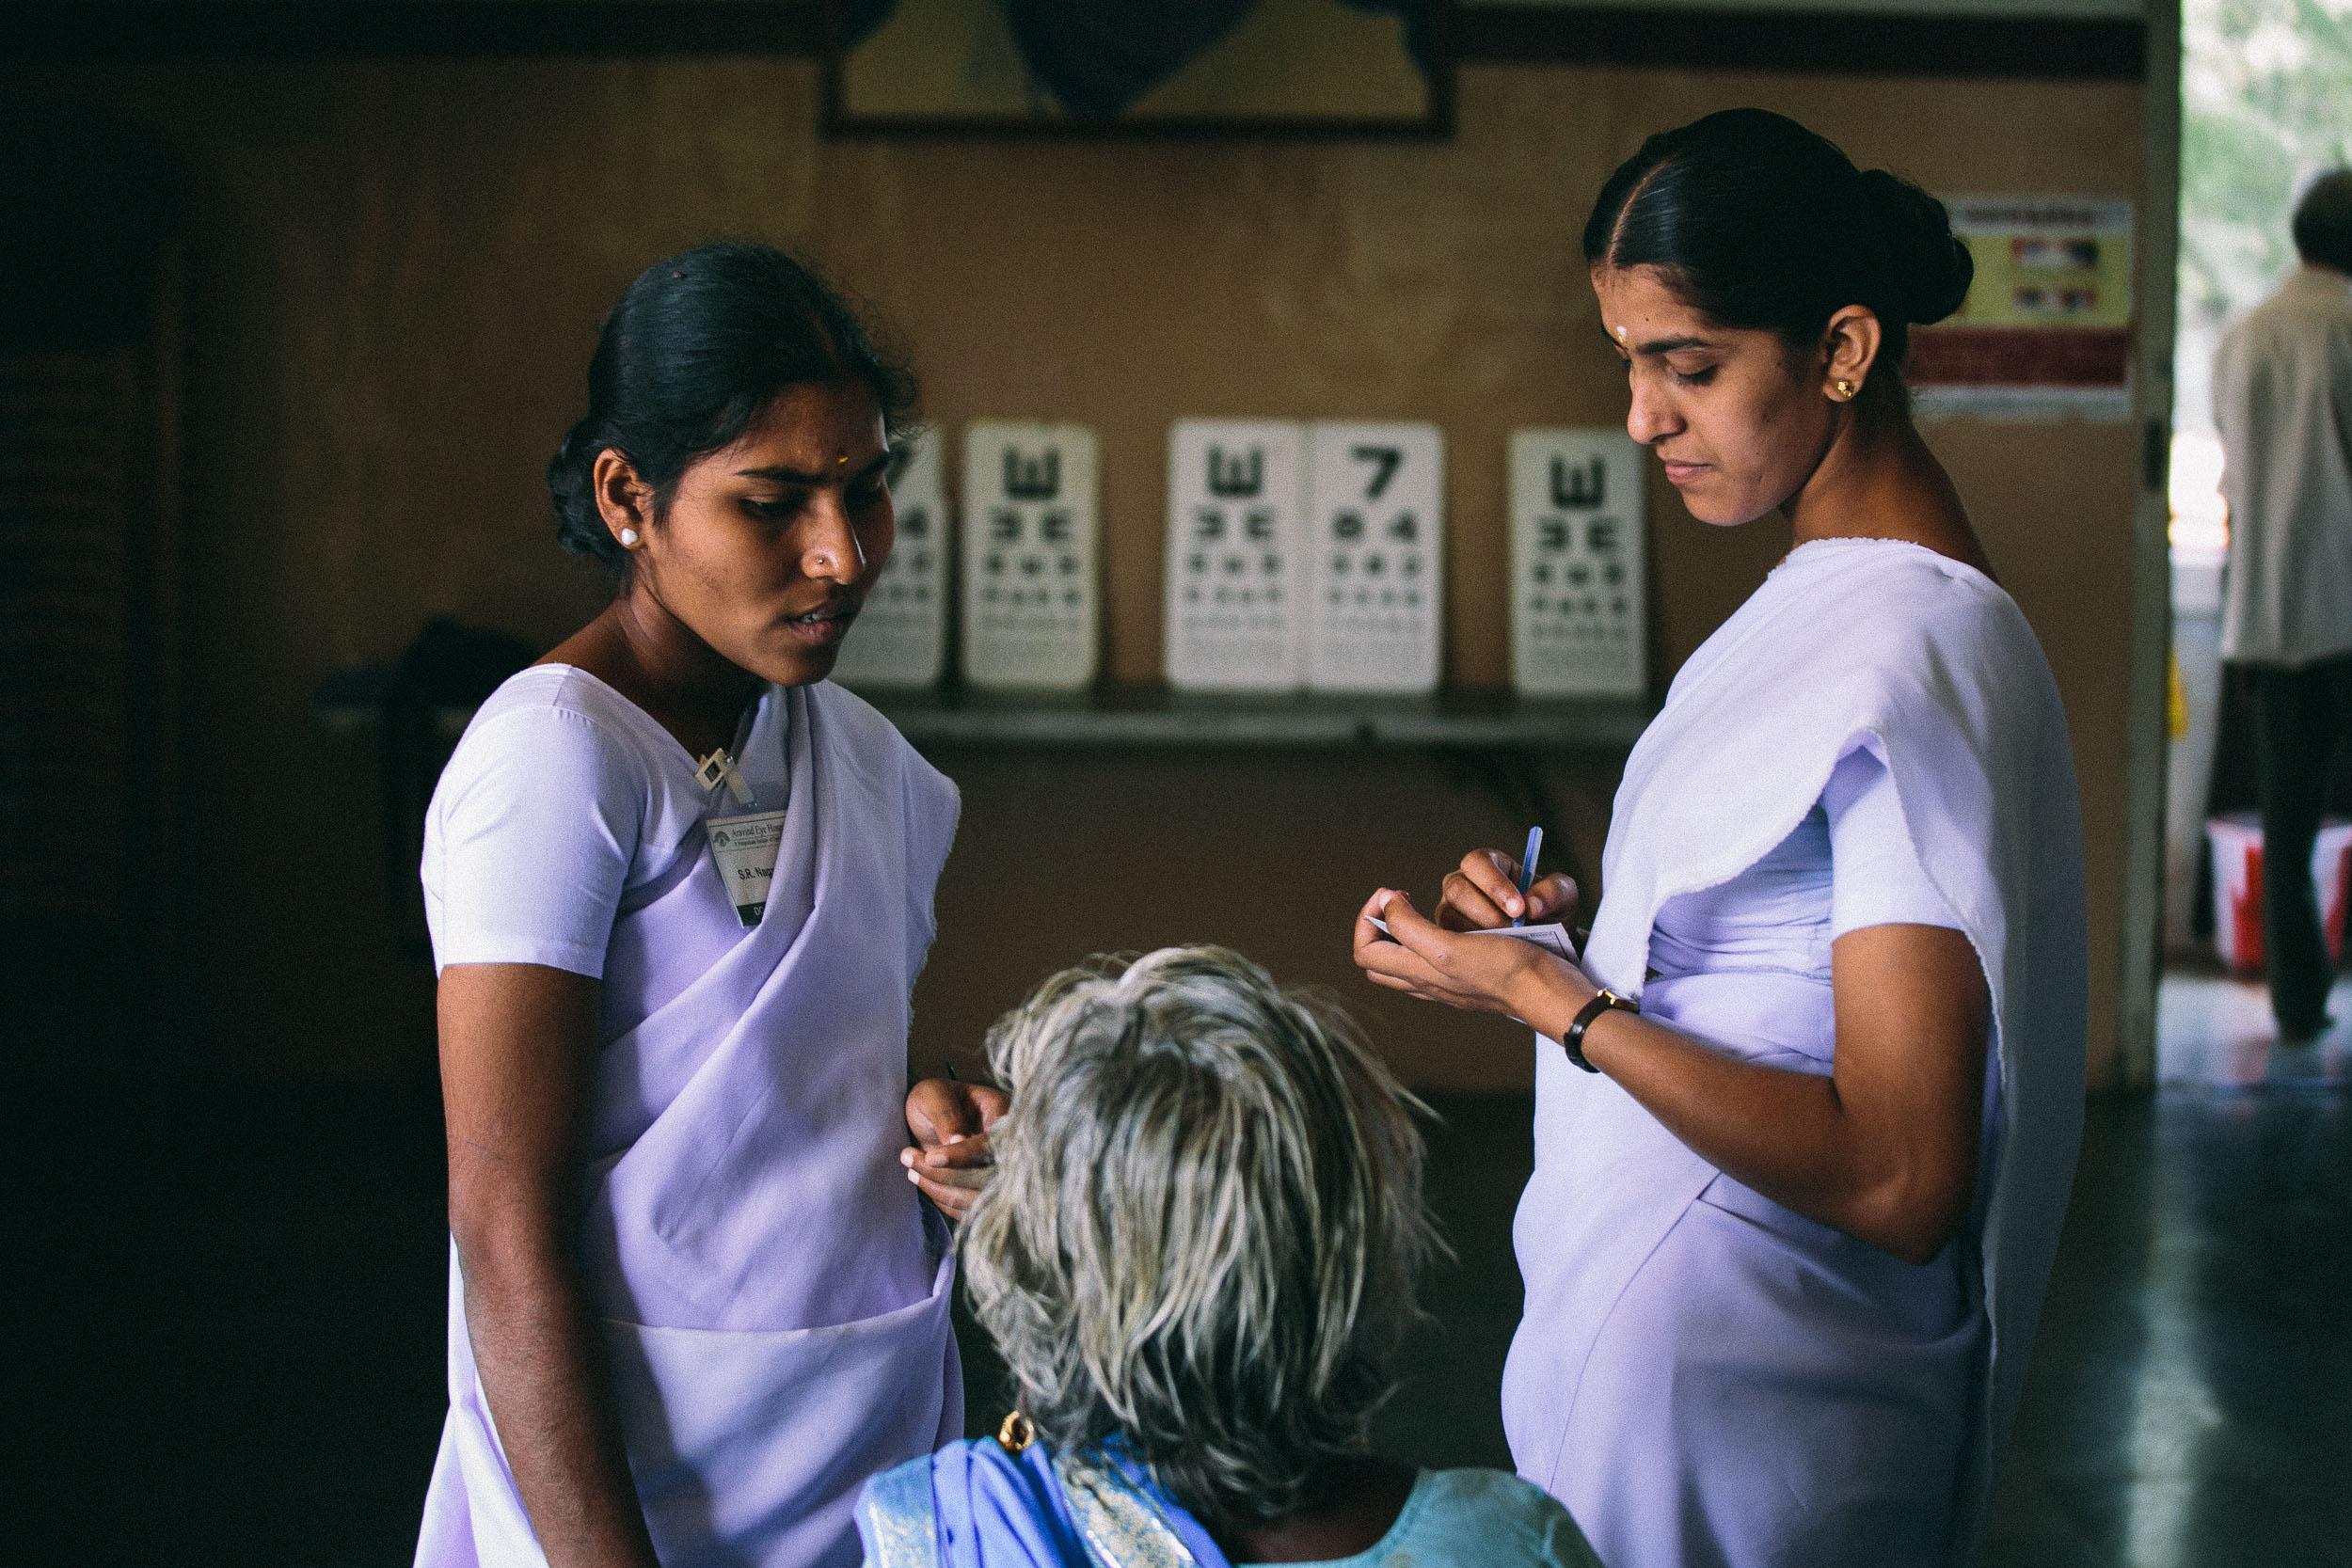 brian-callaway-india-photography-aravind-eye-hospital-15.jpg